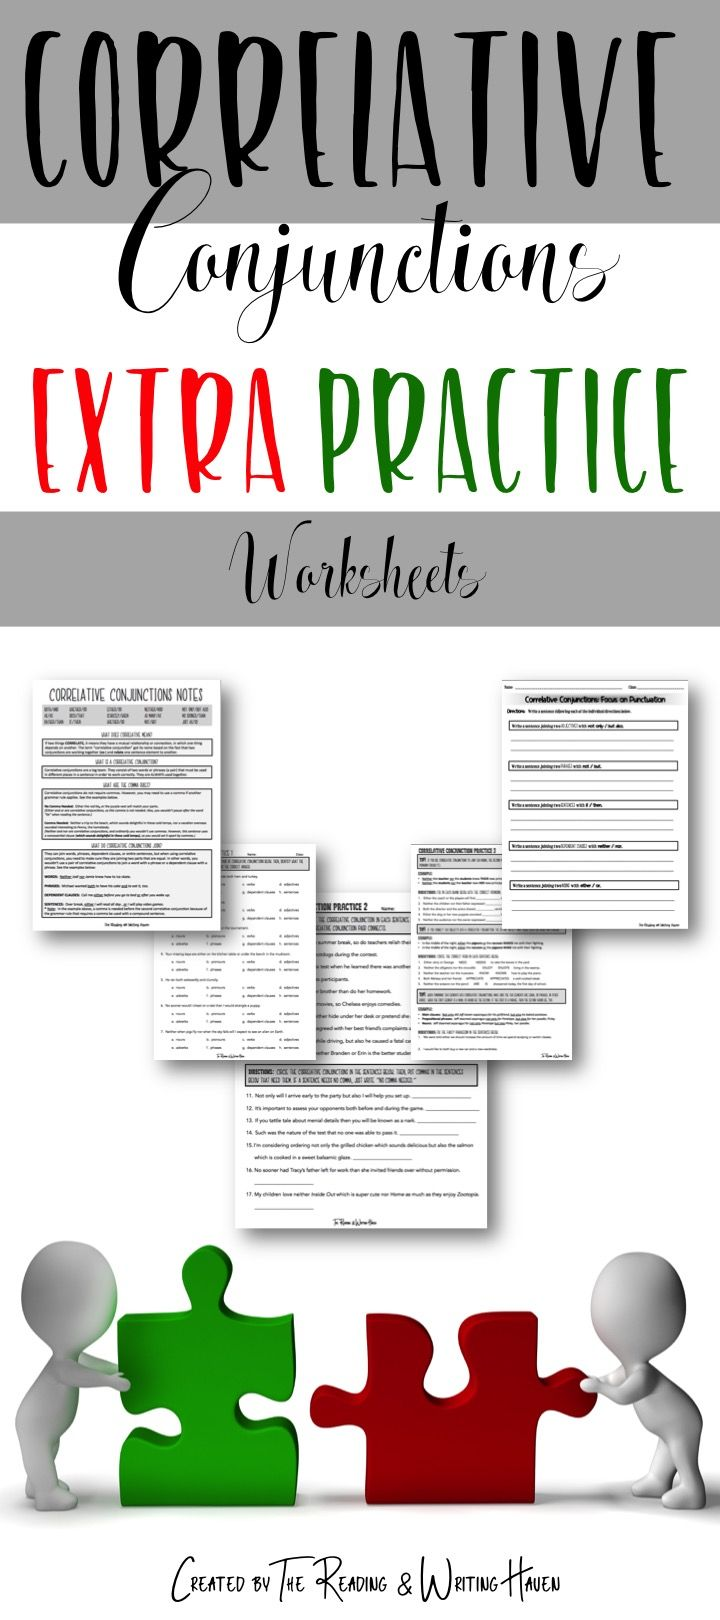 Correlative Conjunctions Practice Worksheets | Worksheets ...